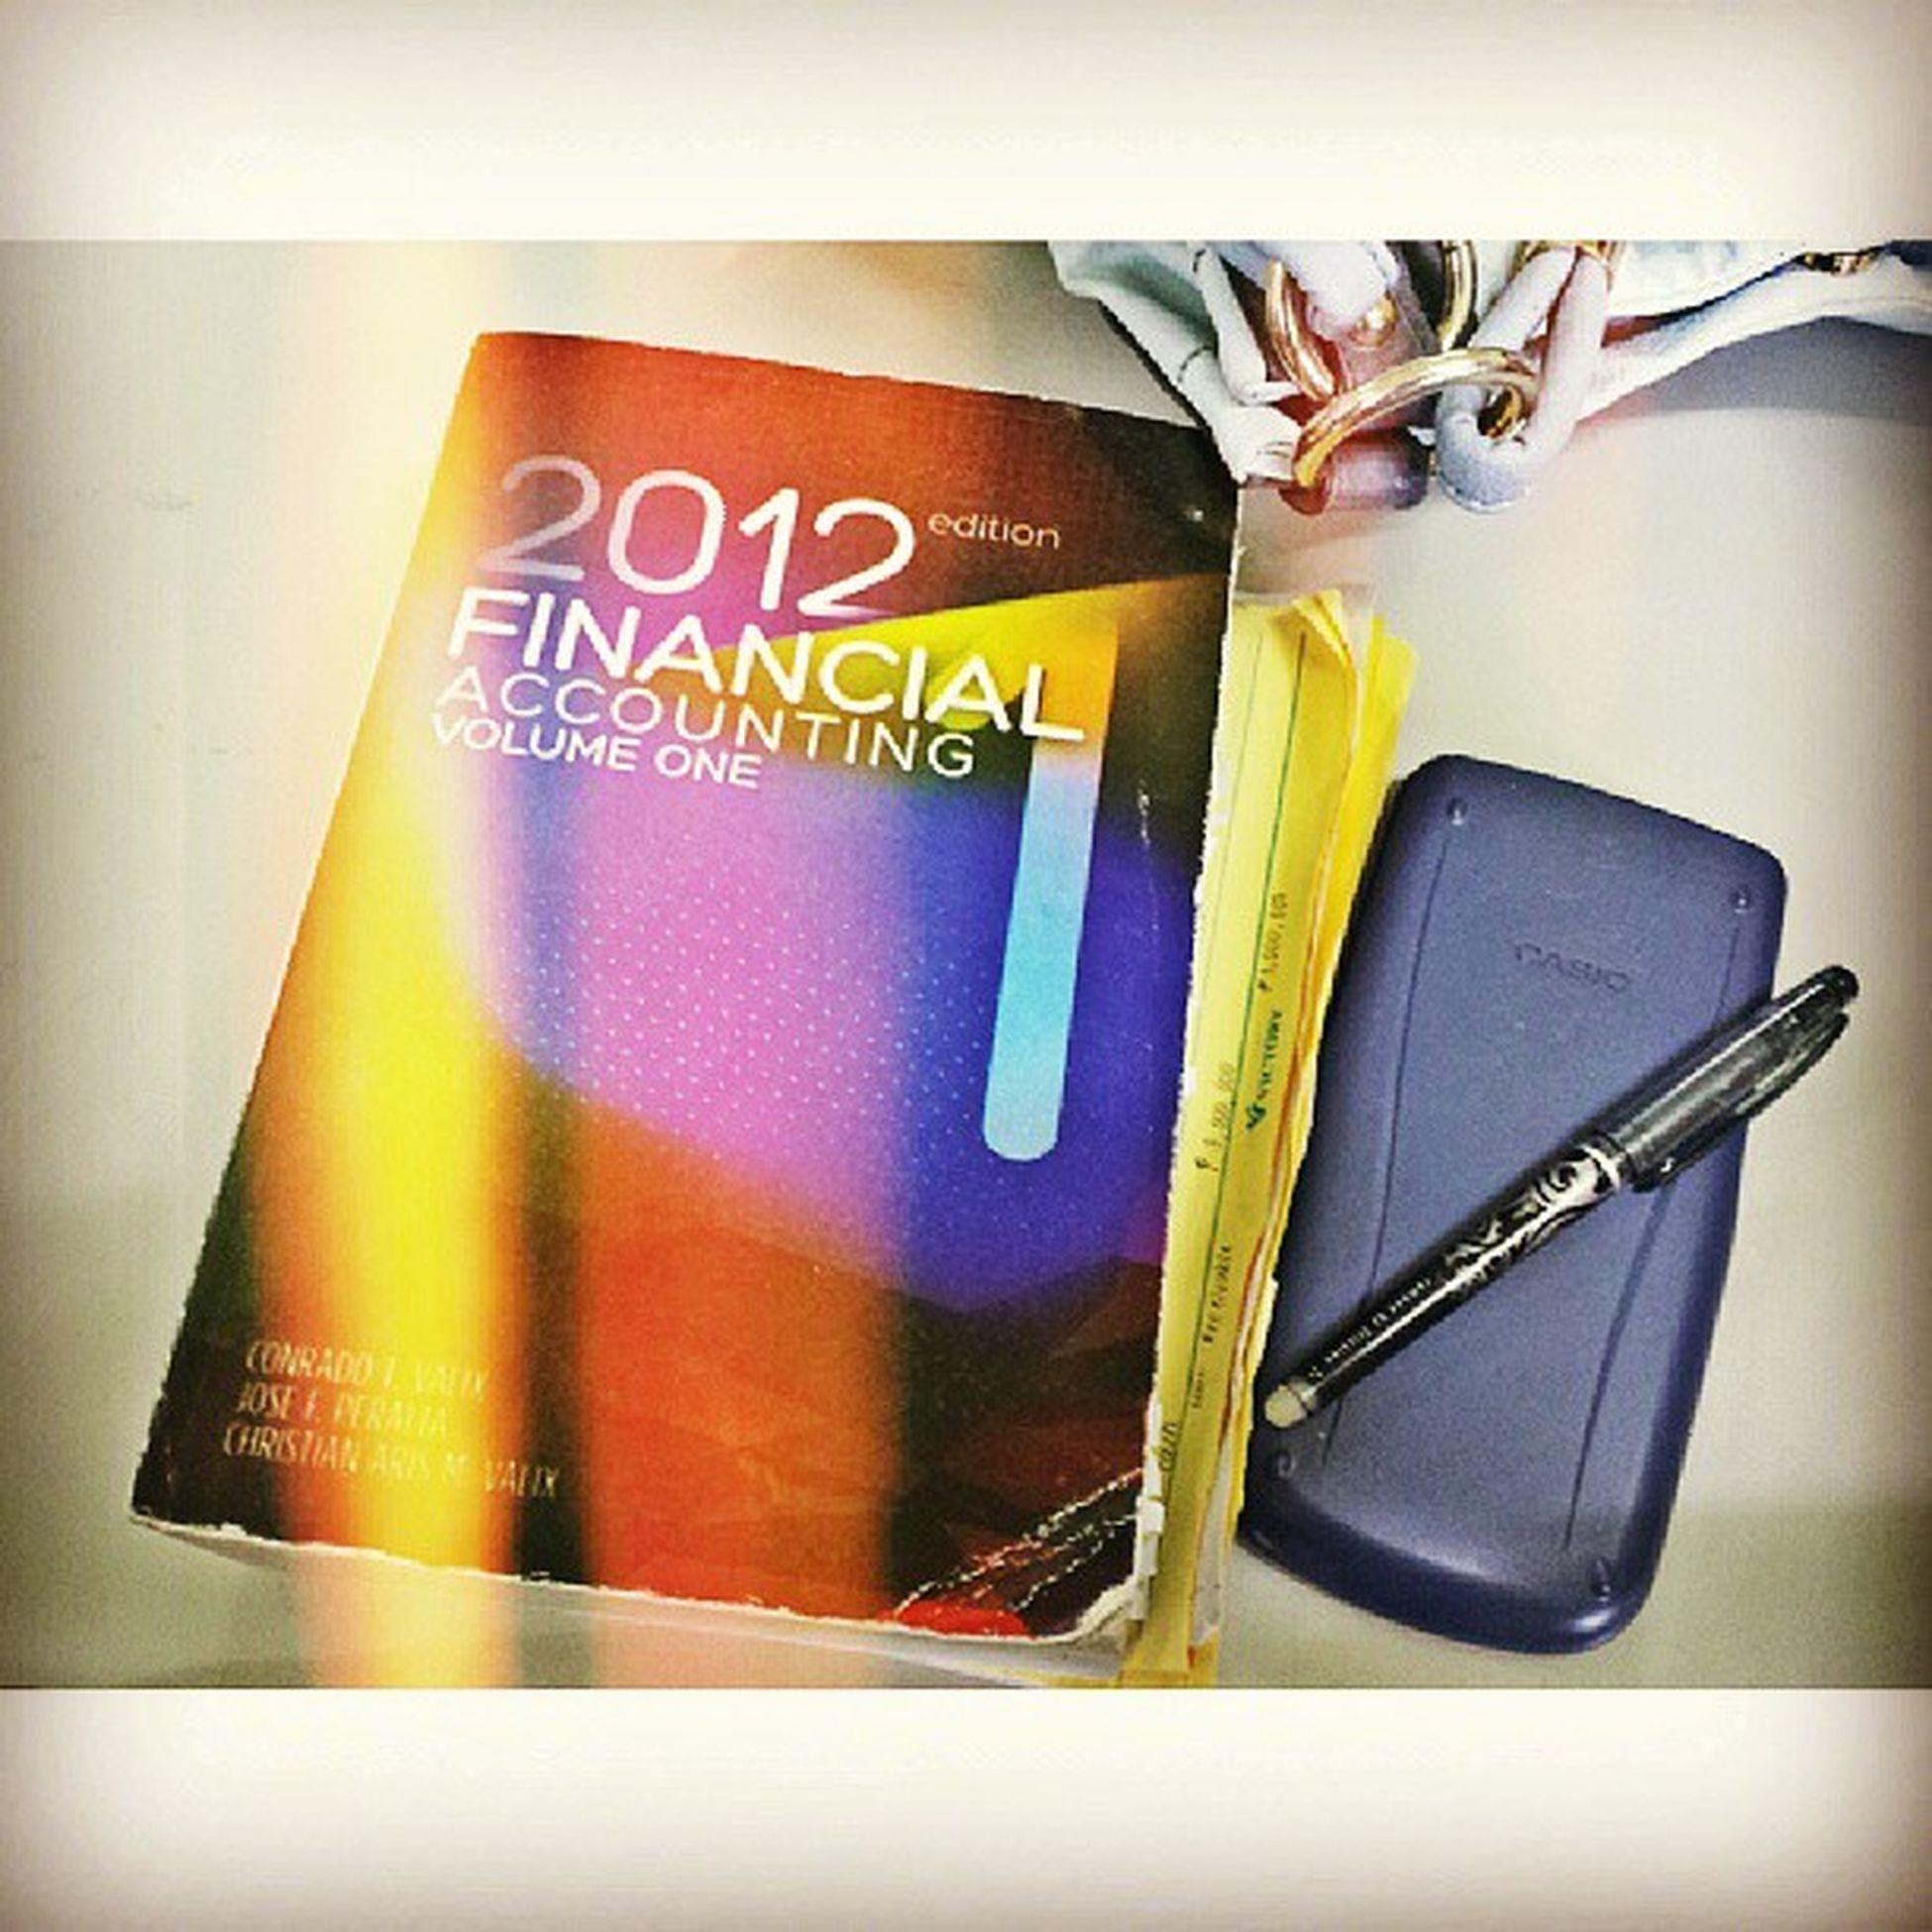 We meet again. Hohoho :)))) Financialaccounting